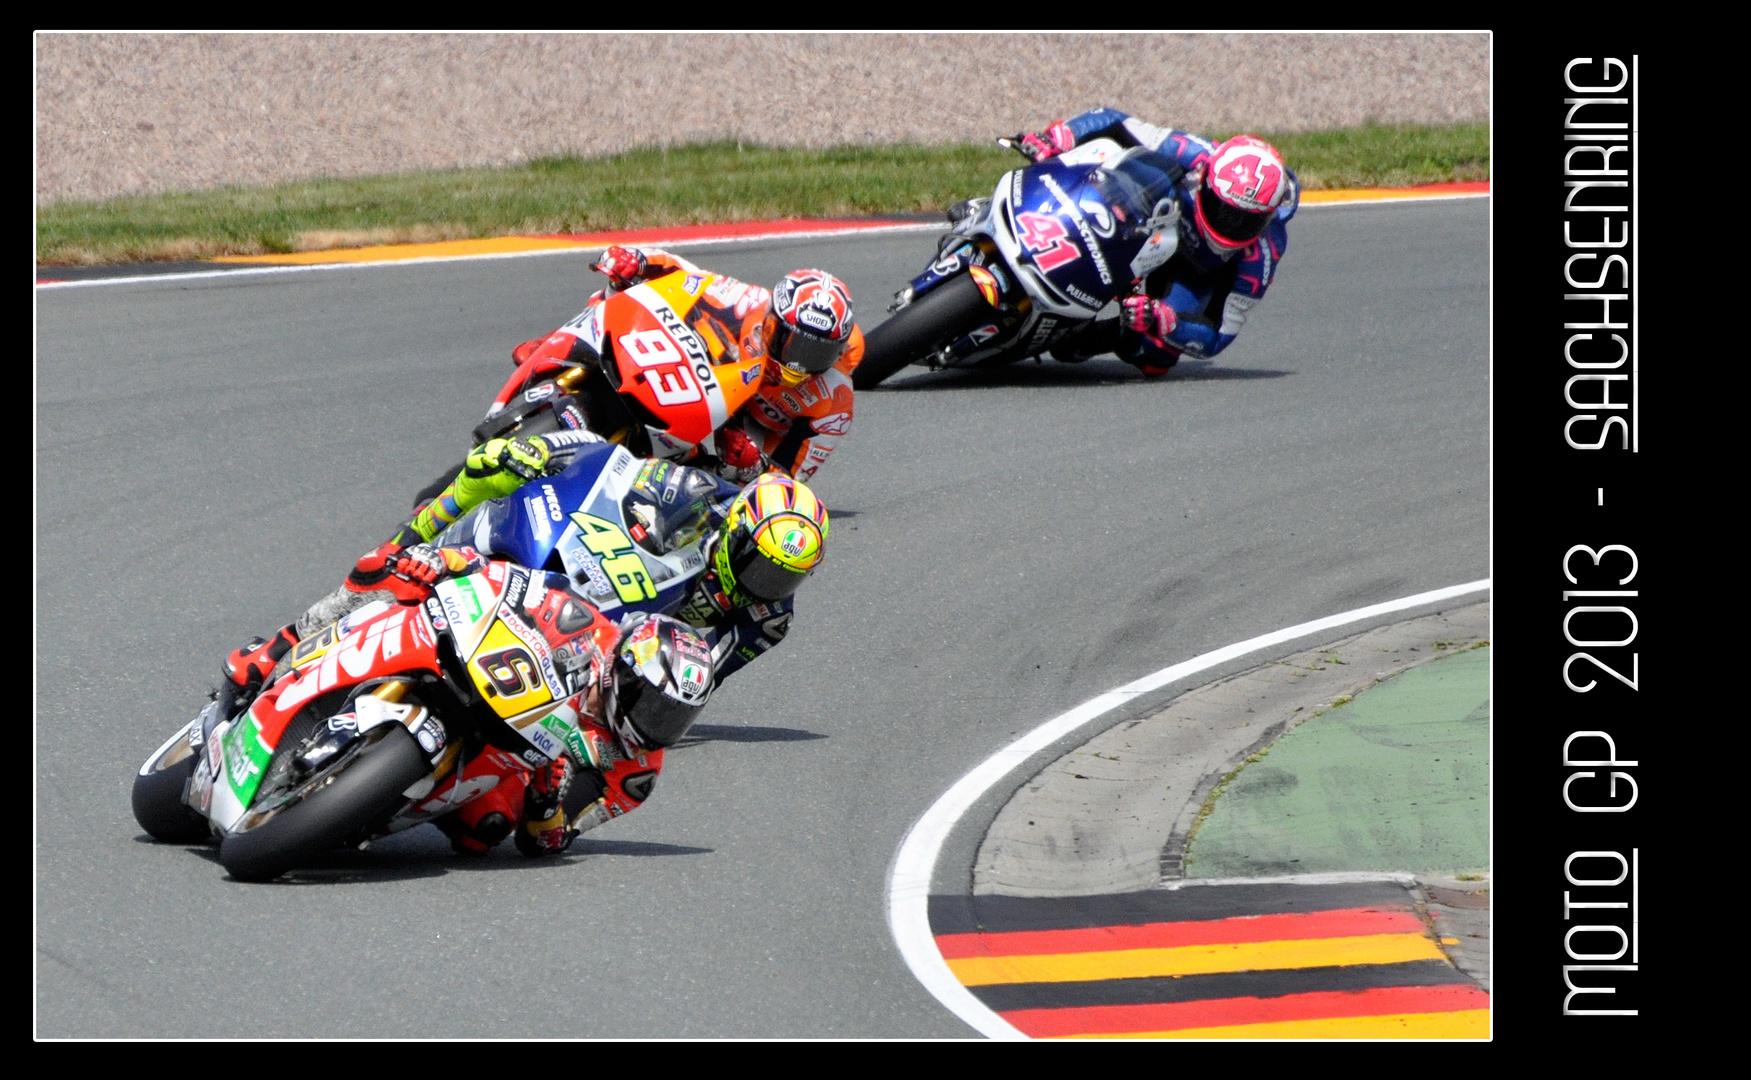 Moto GP 2013 - Am Sachsenring